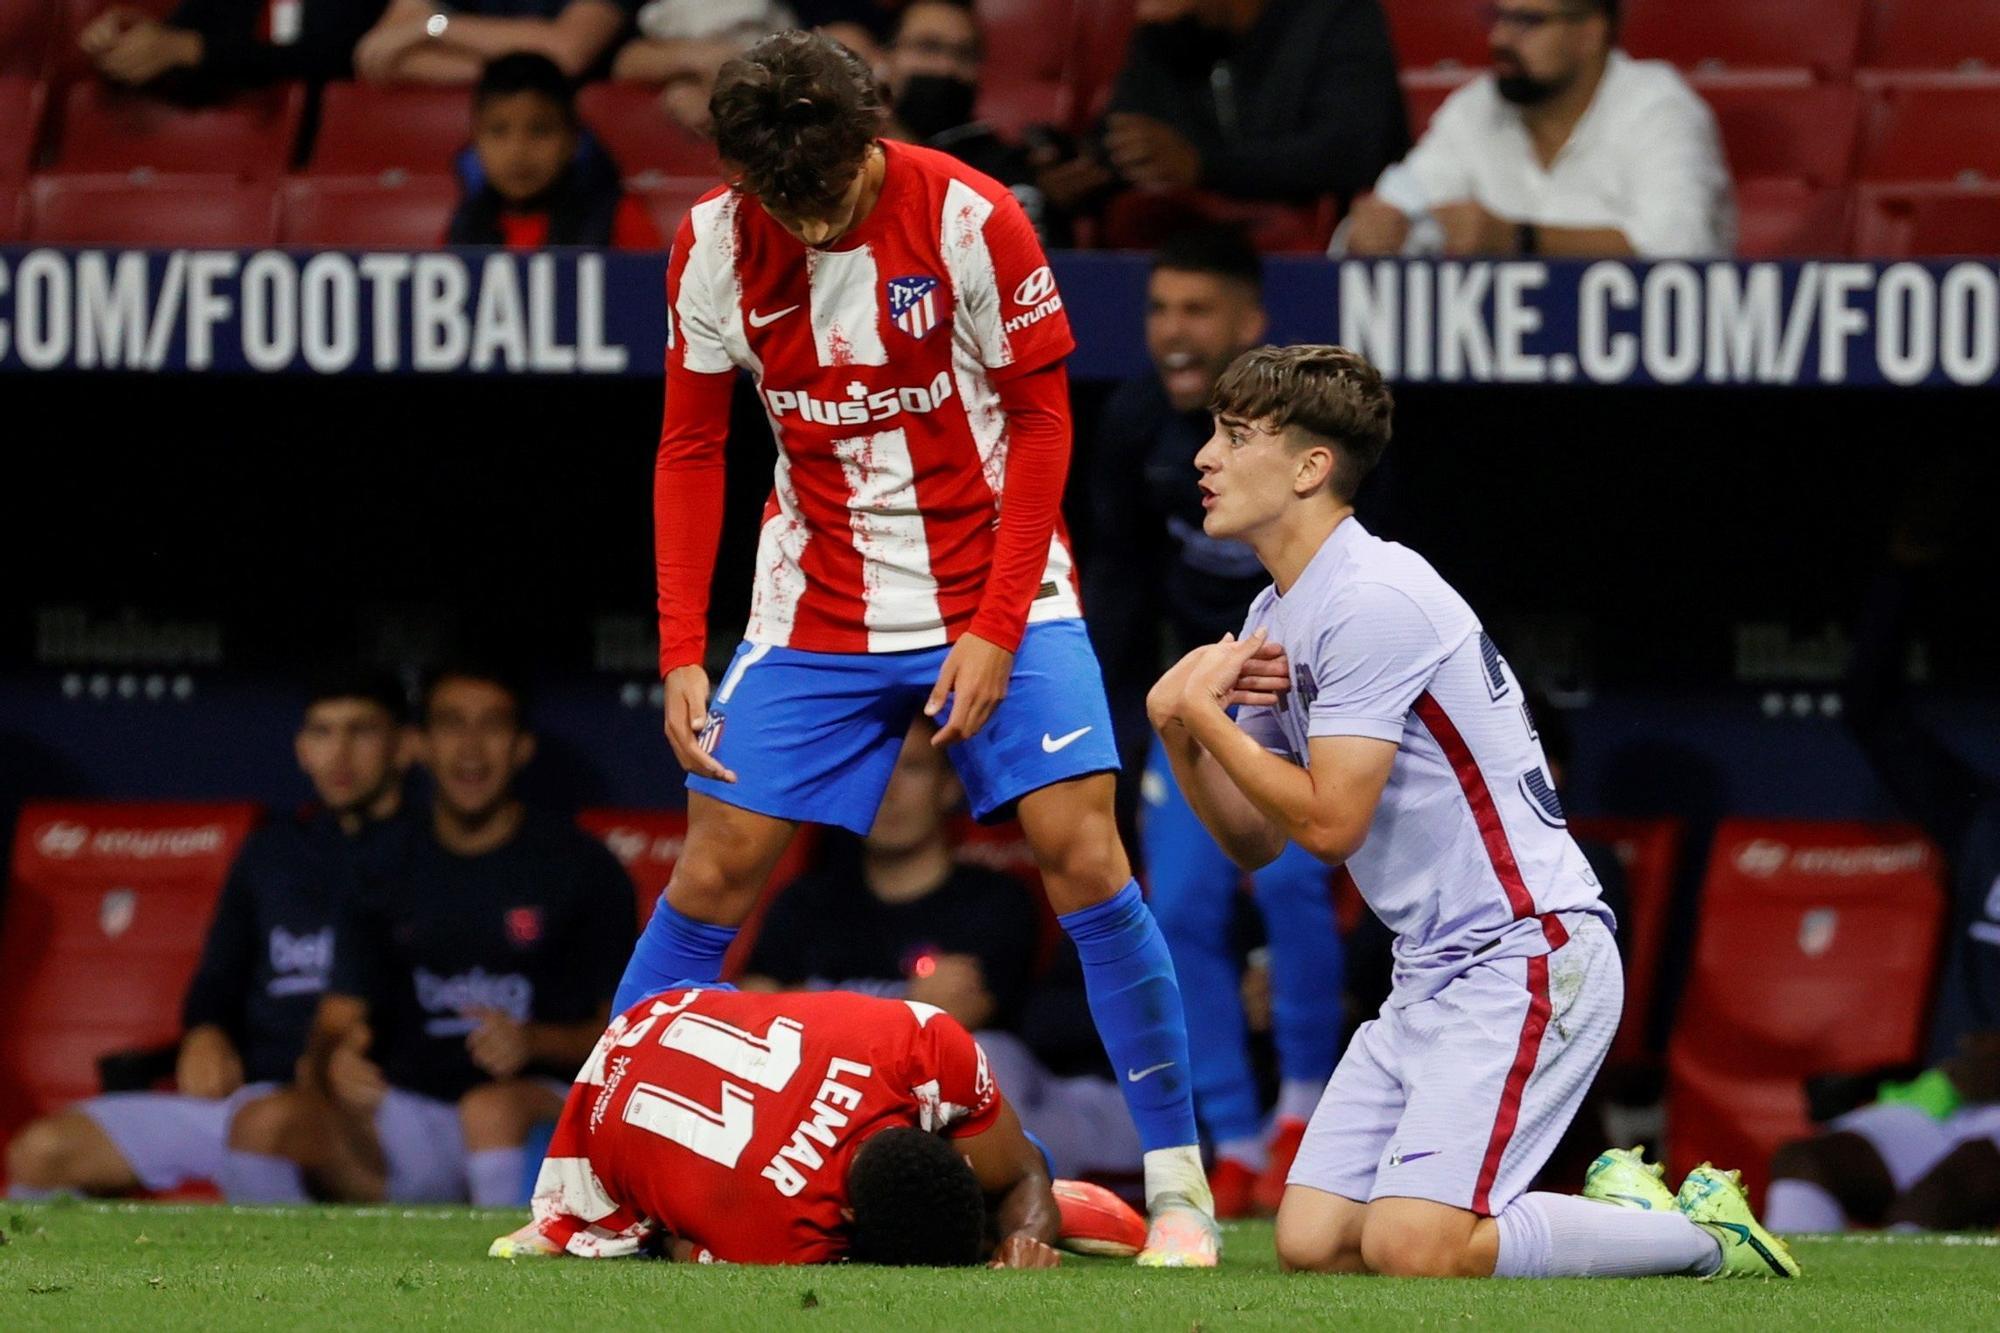 Atlético de Madrid - Barcelona, in pictures